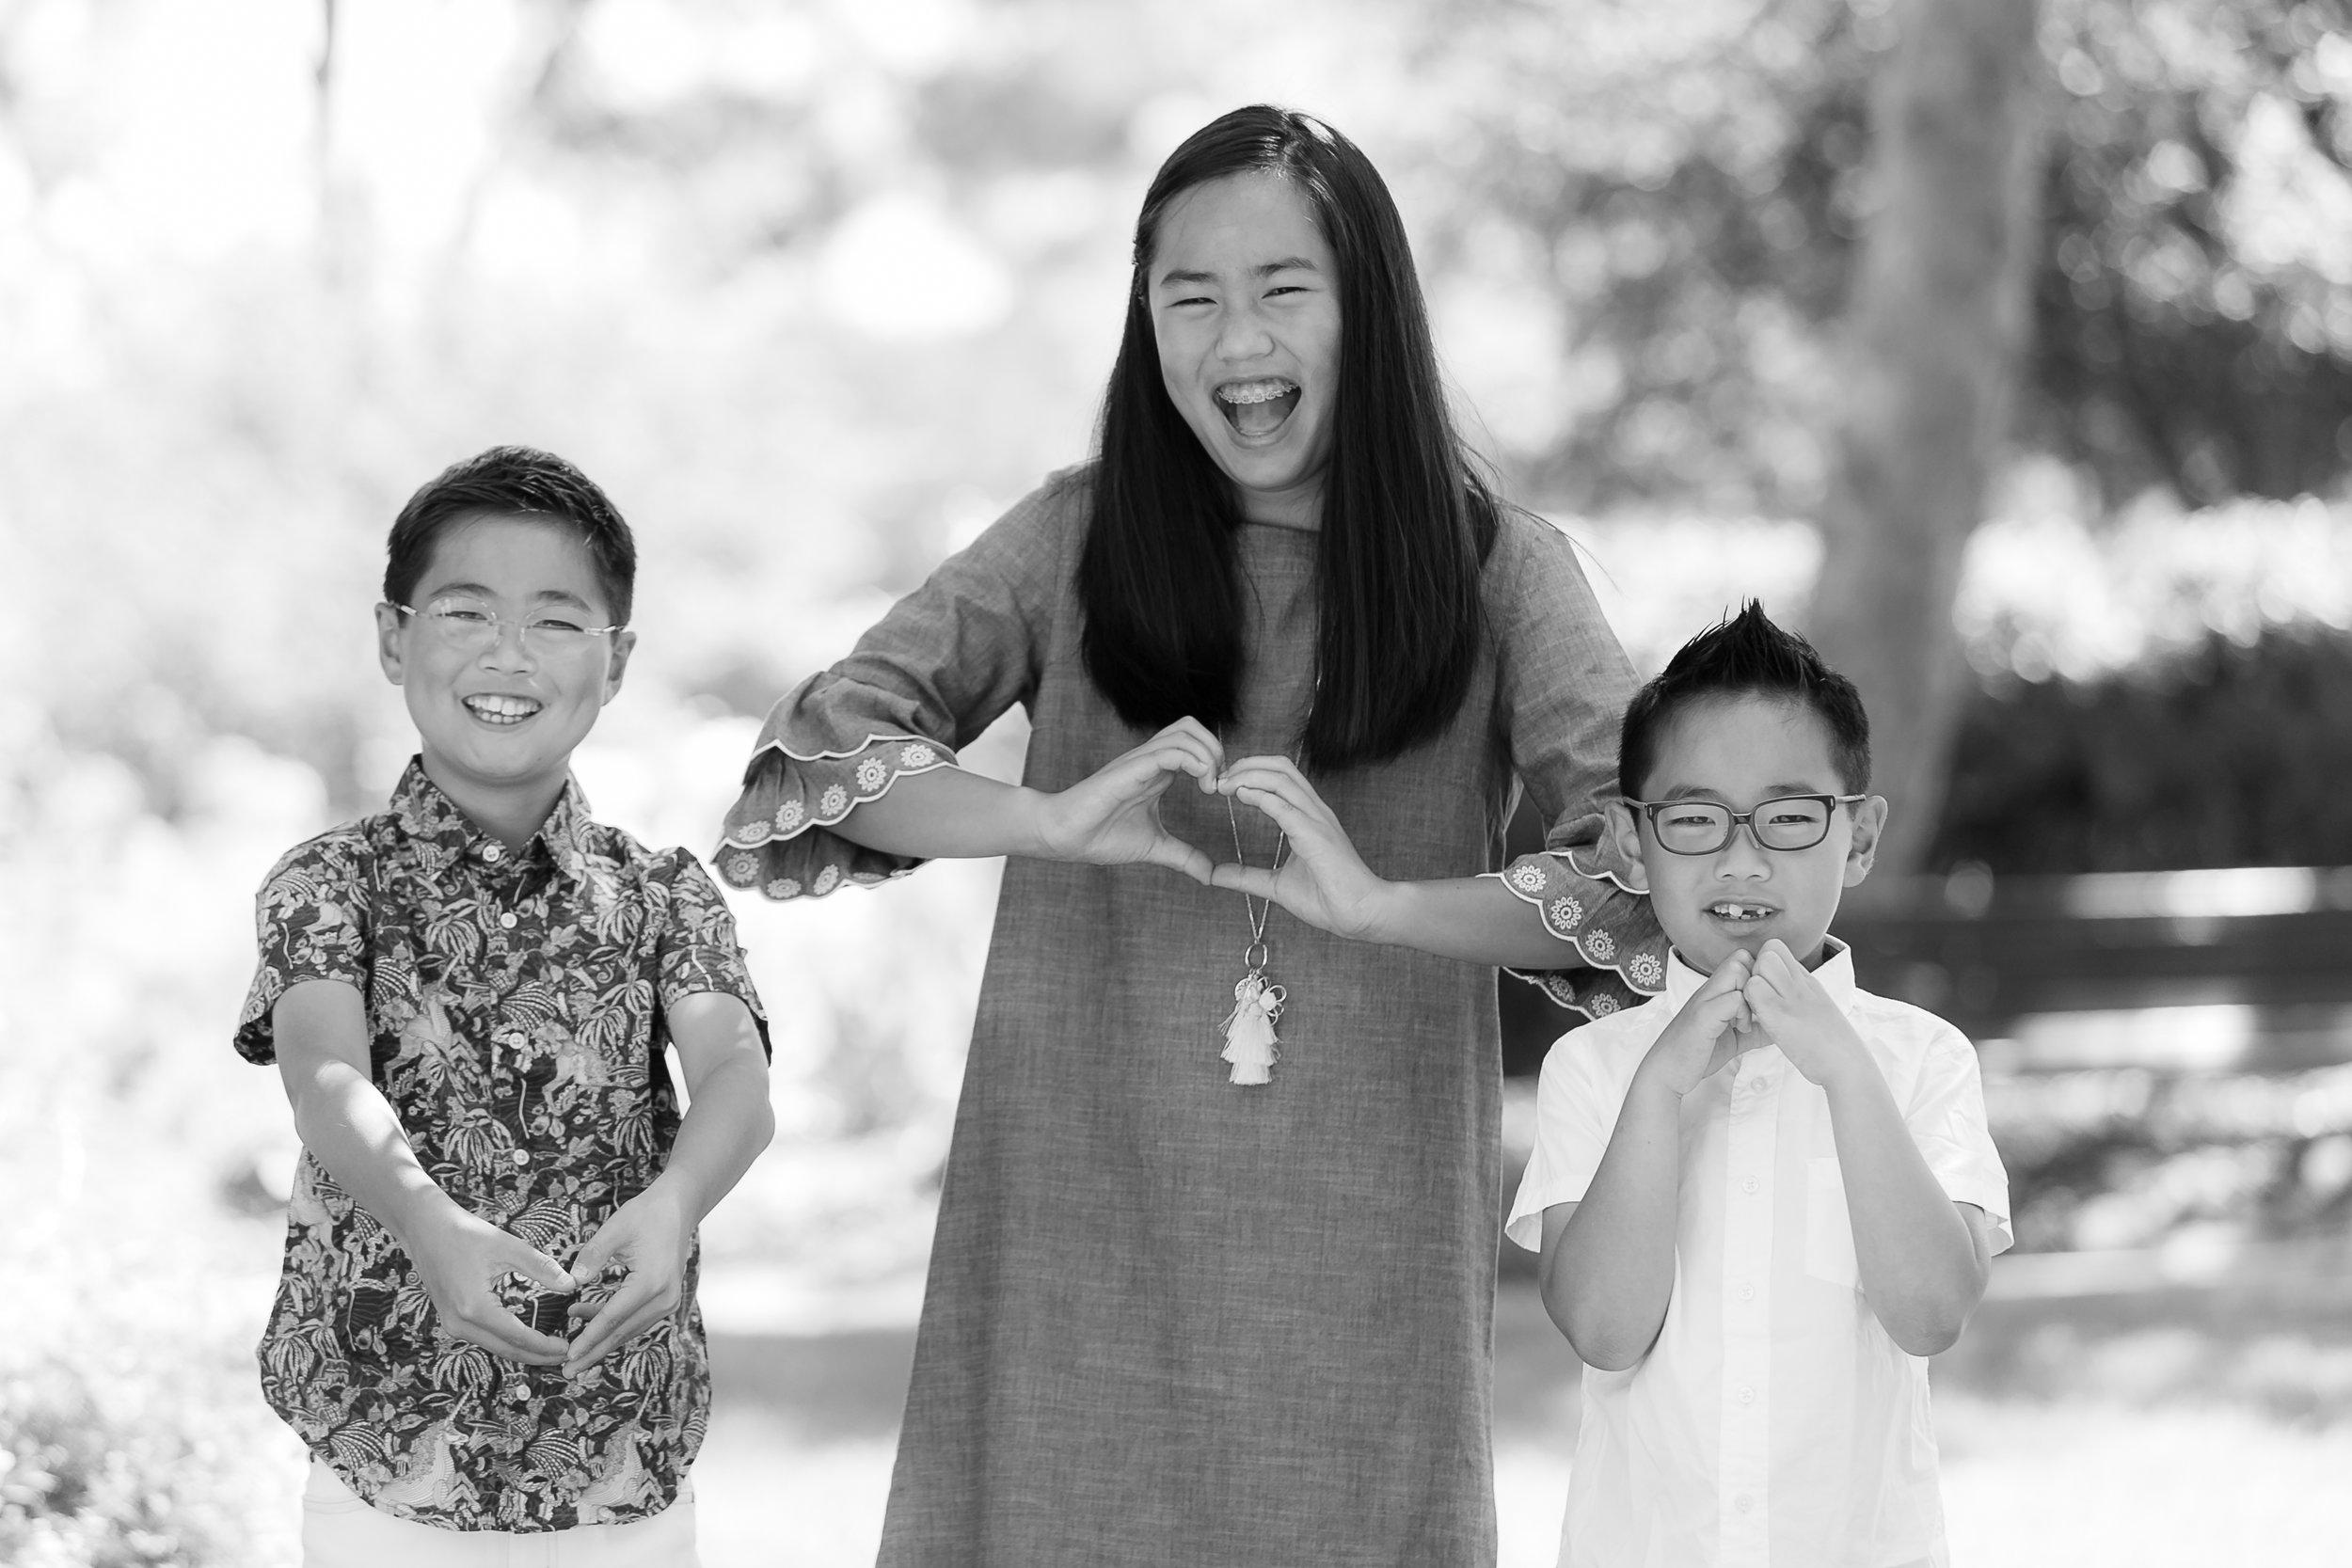 Mountain_View_Children_Family_Portrait_006.jpg